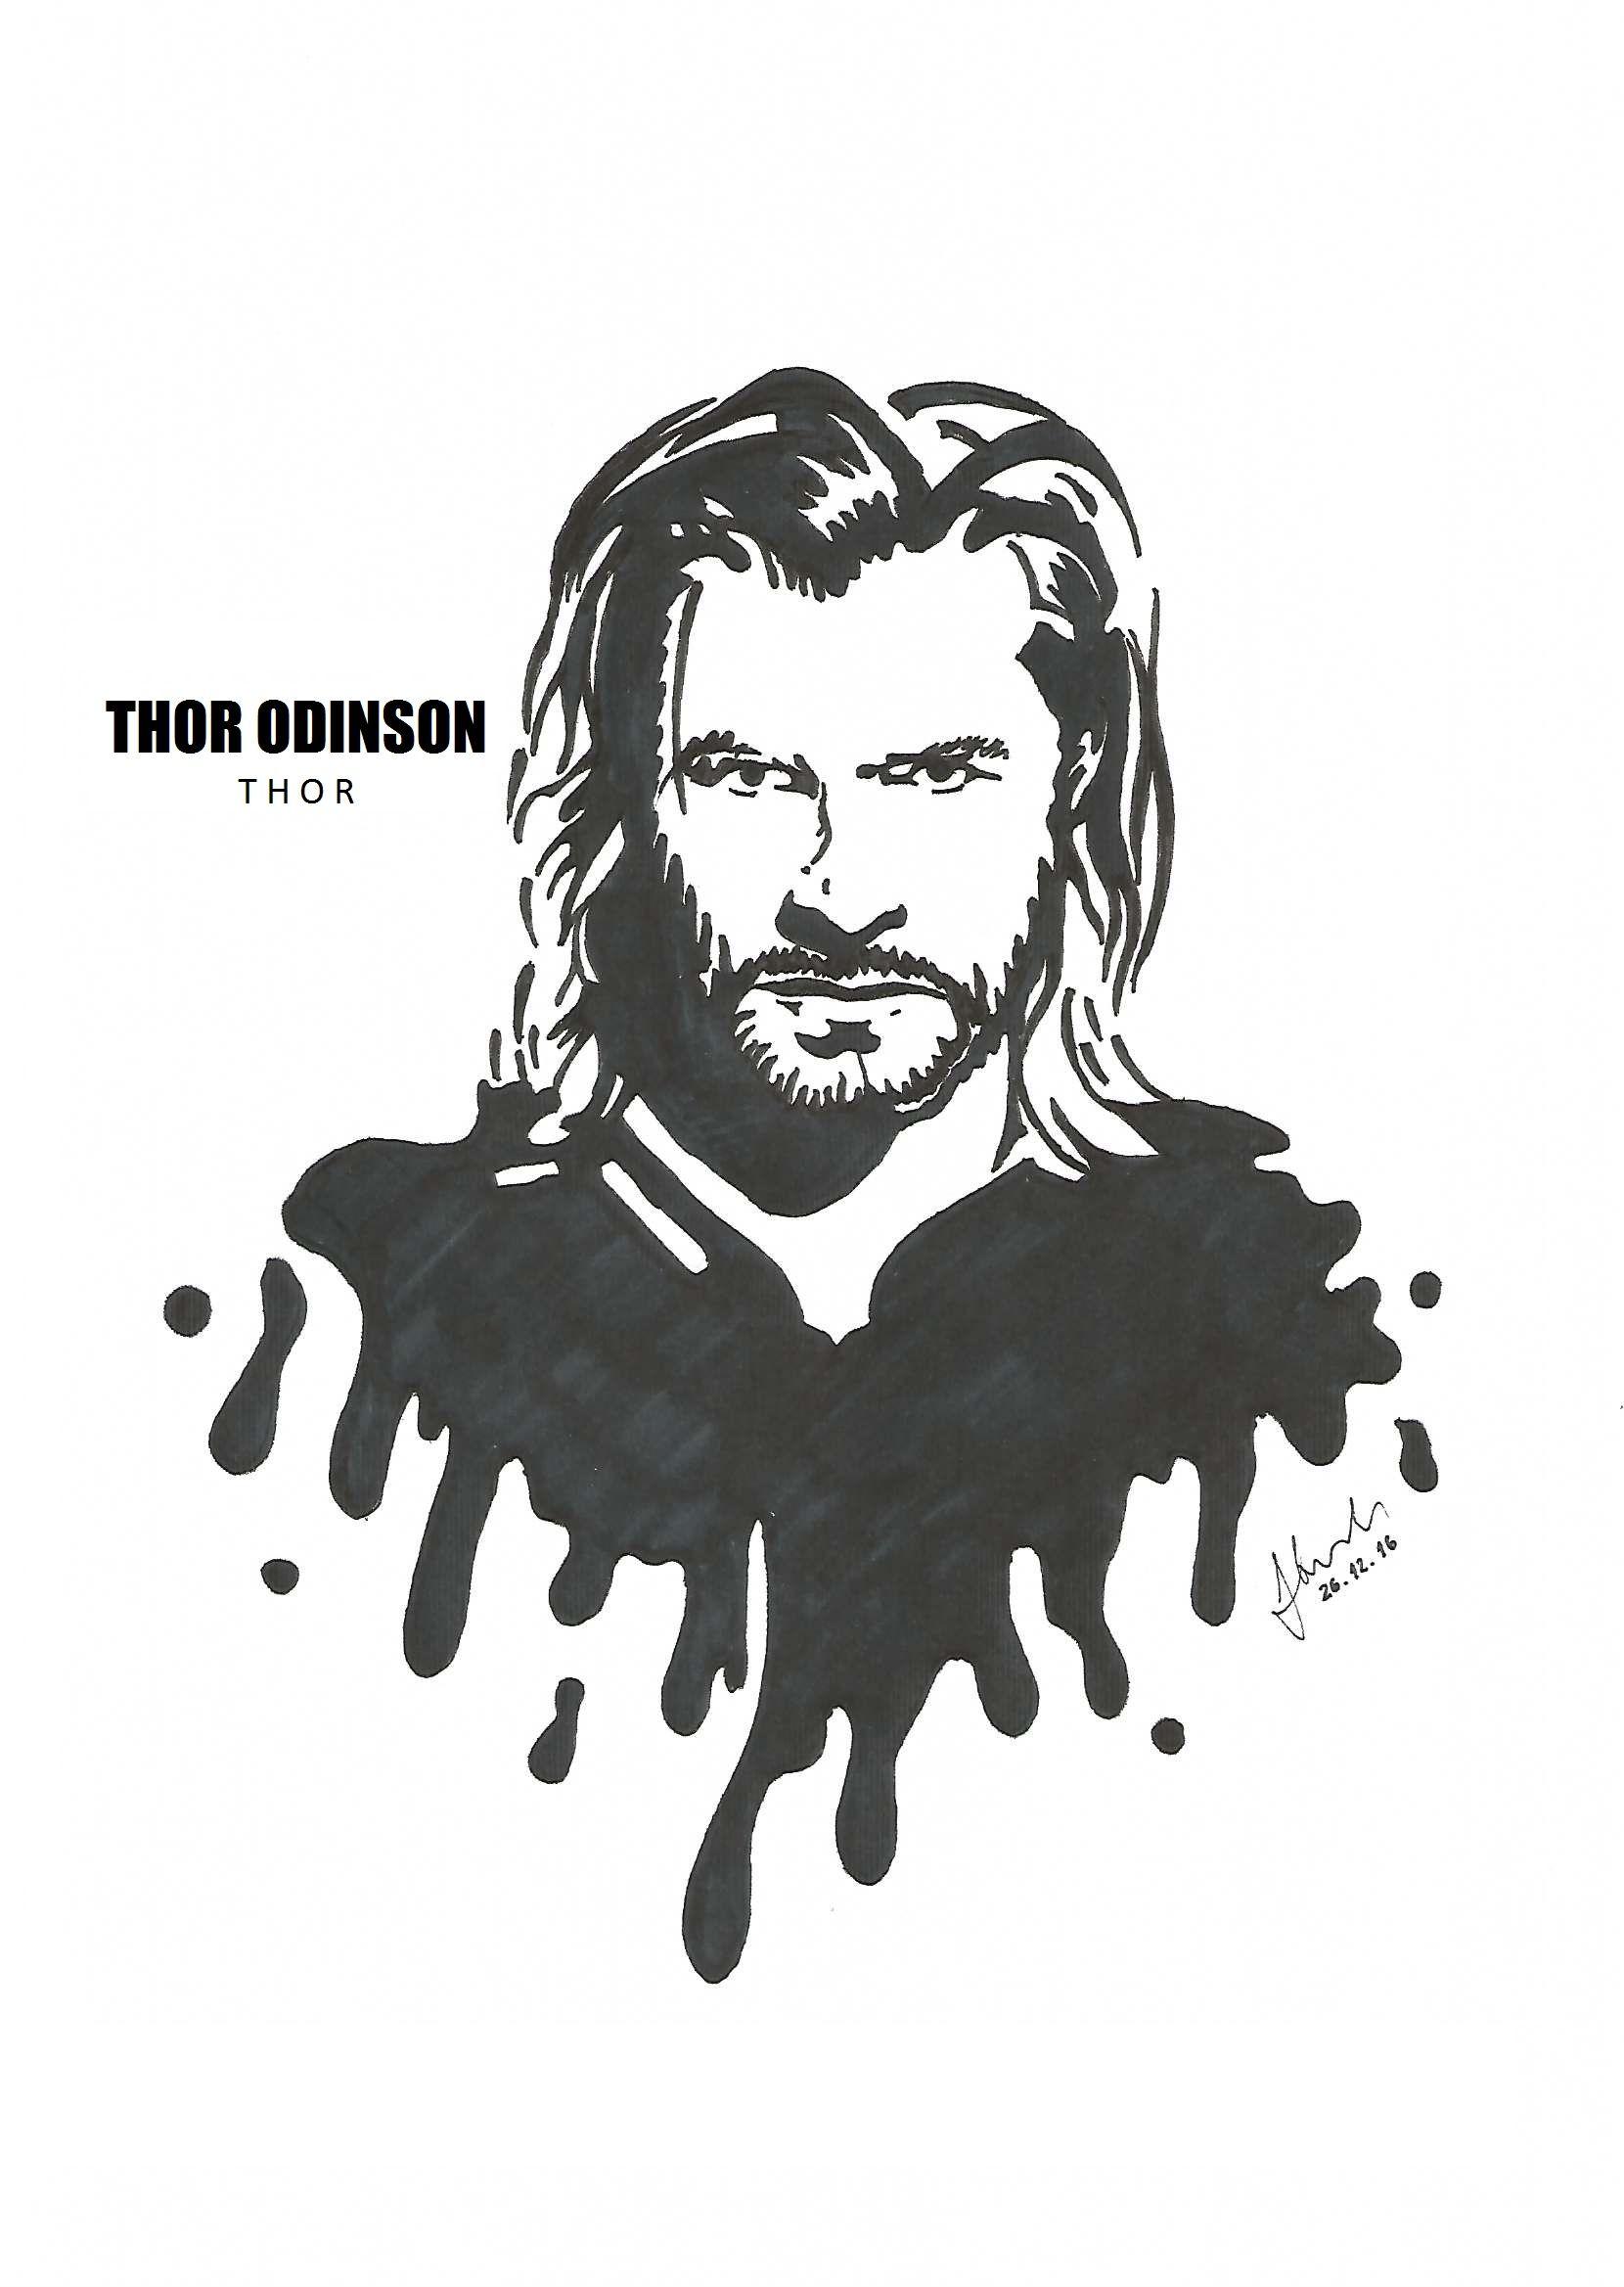 Thor odinson chris hemsworth drawing blackandwhite